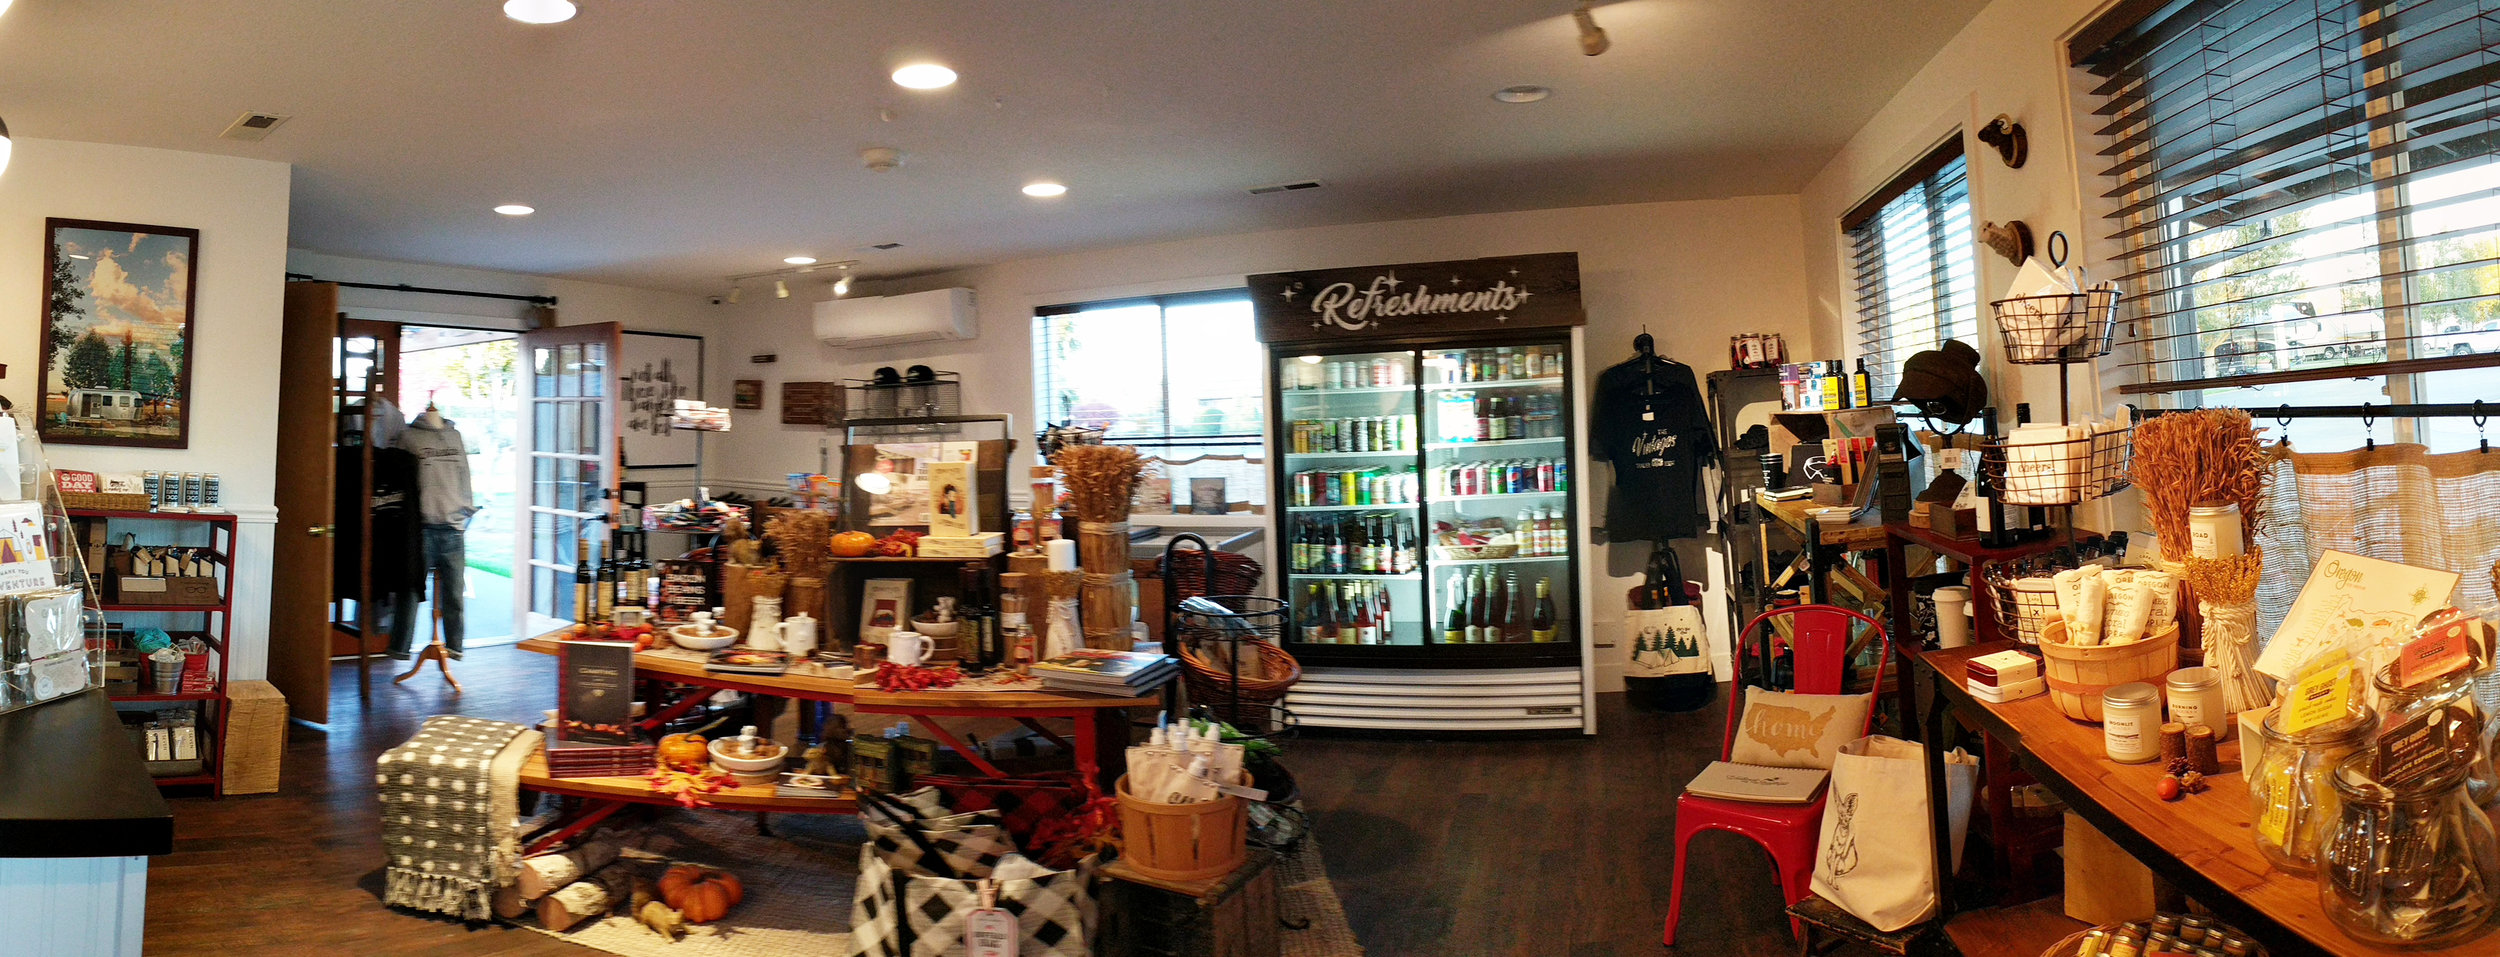 The Vintages general store.jpg